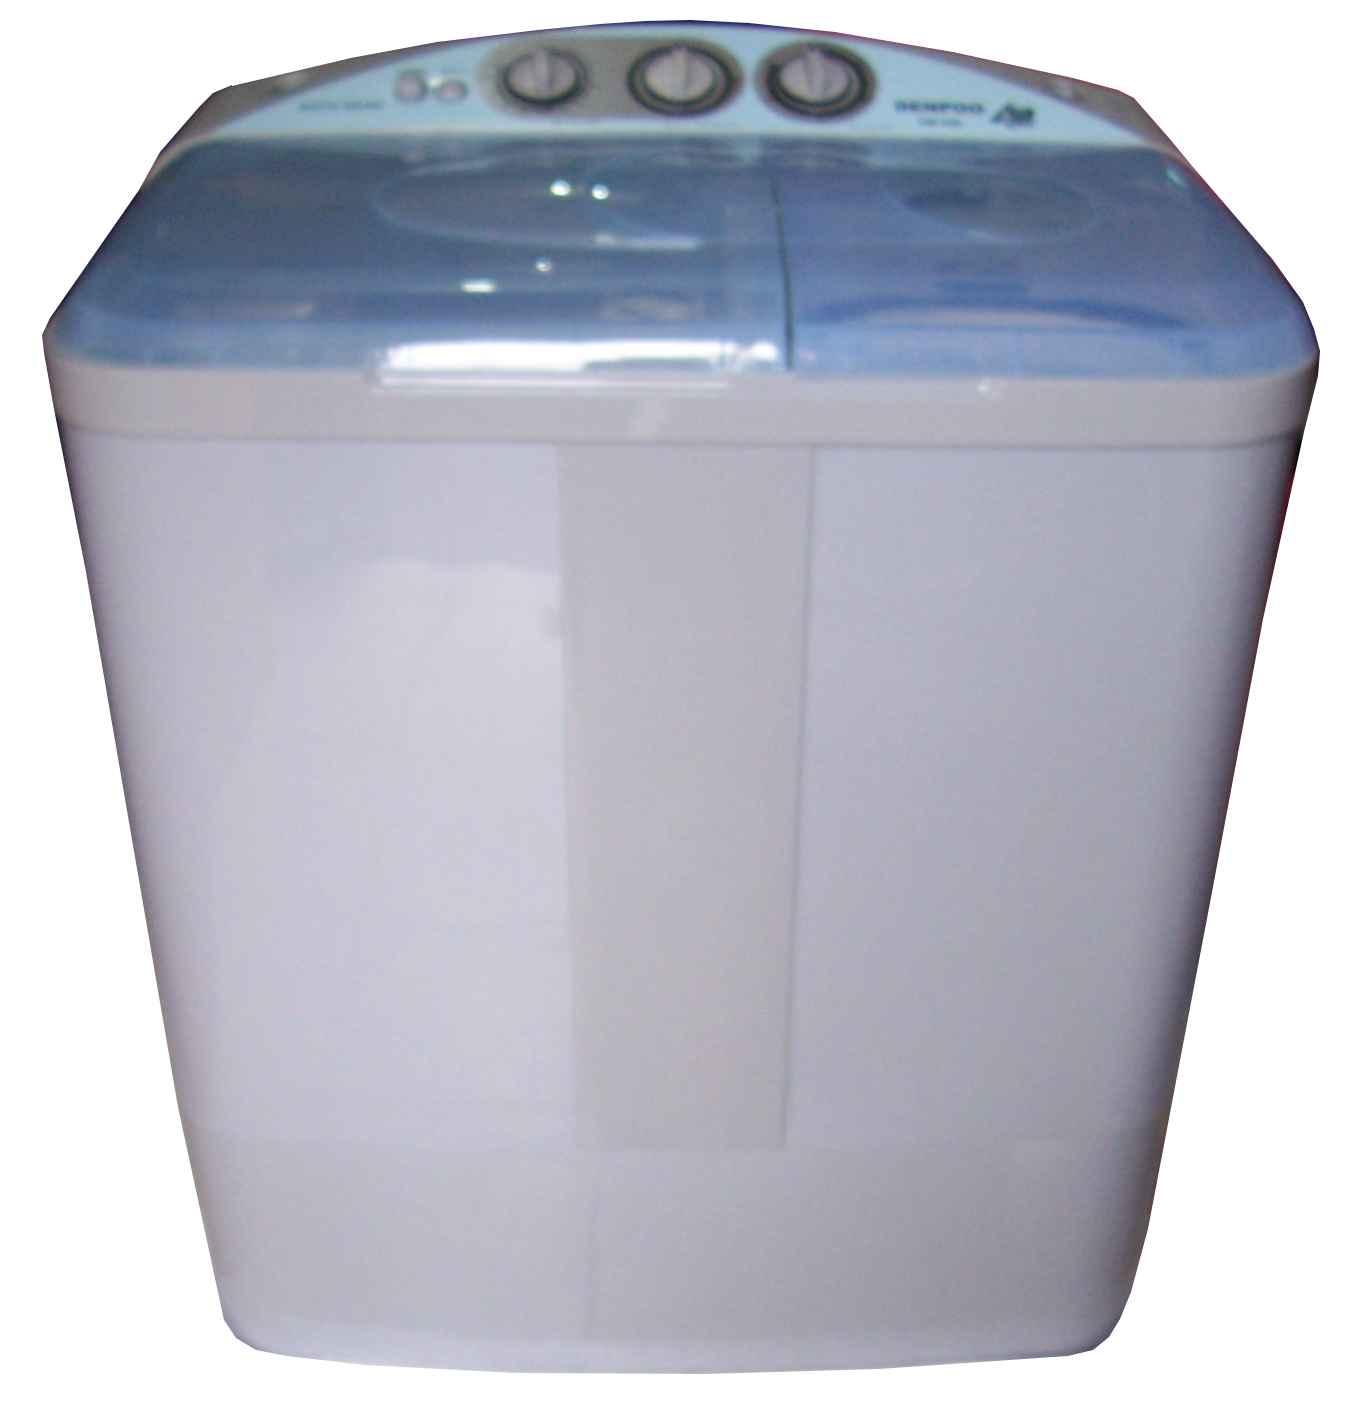 Daftar Harga Mesin Cuci